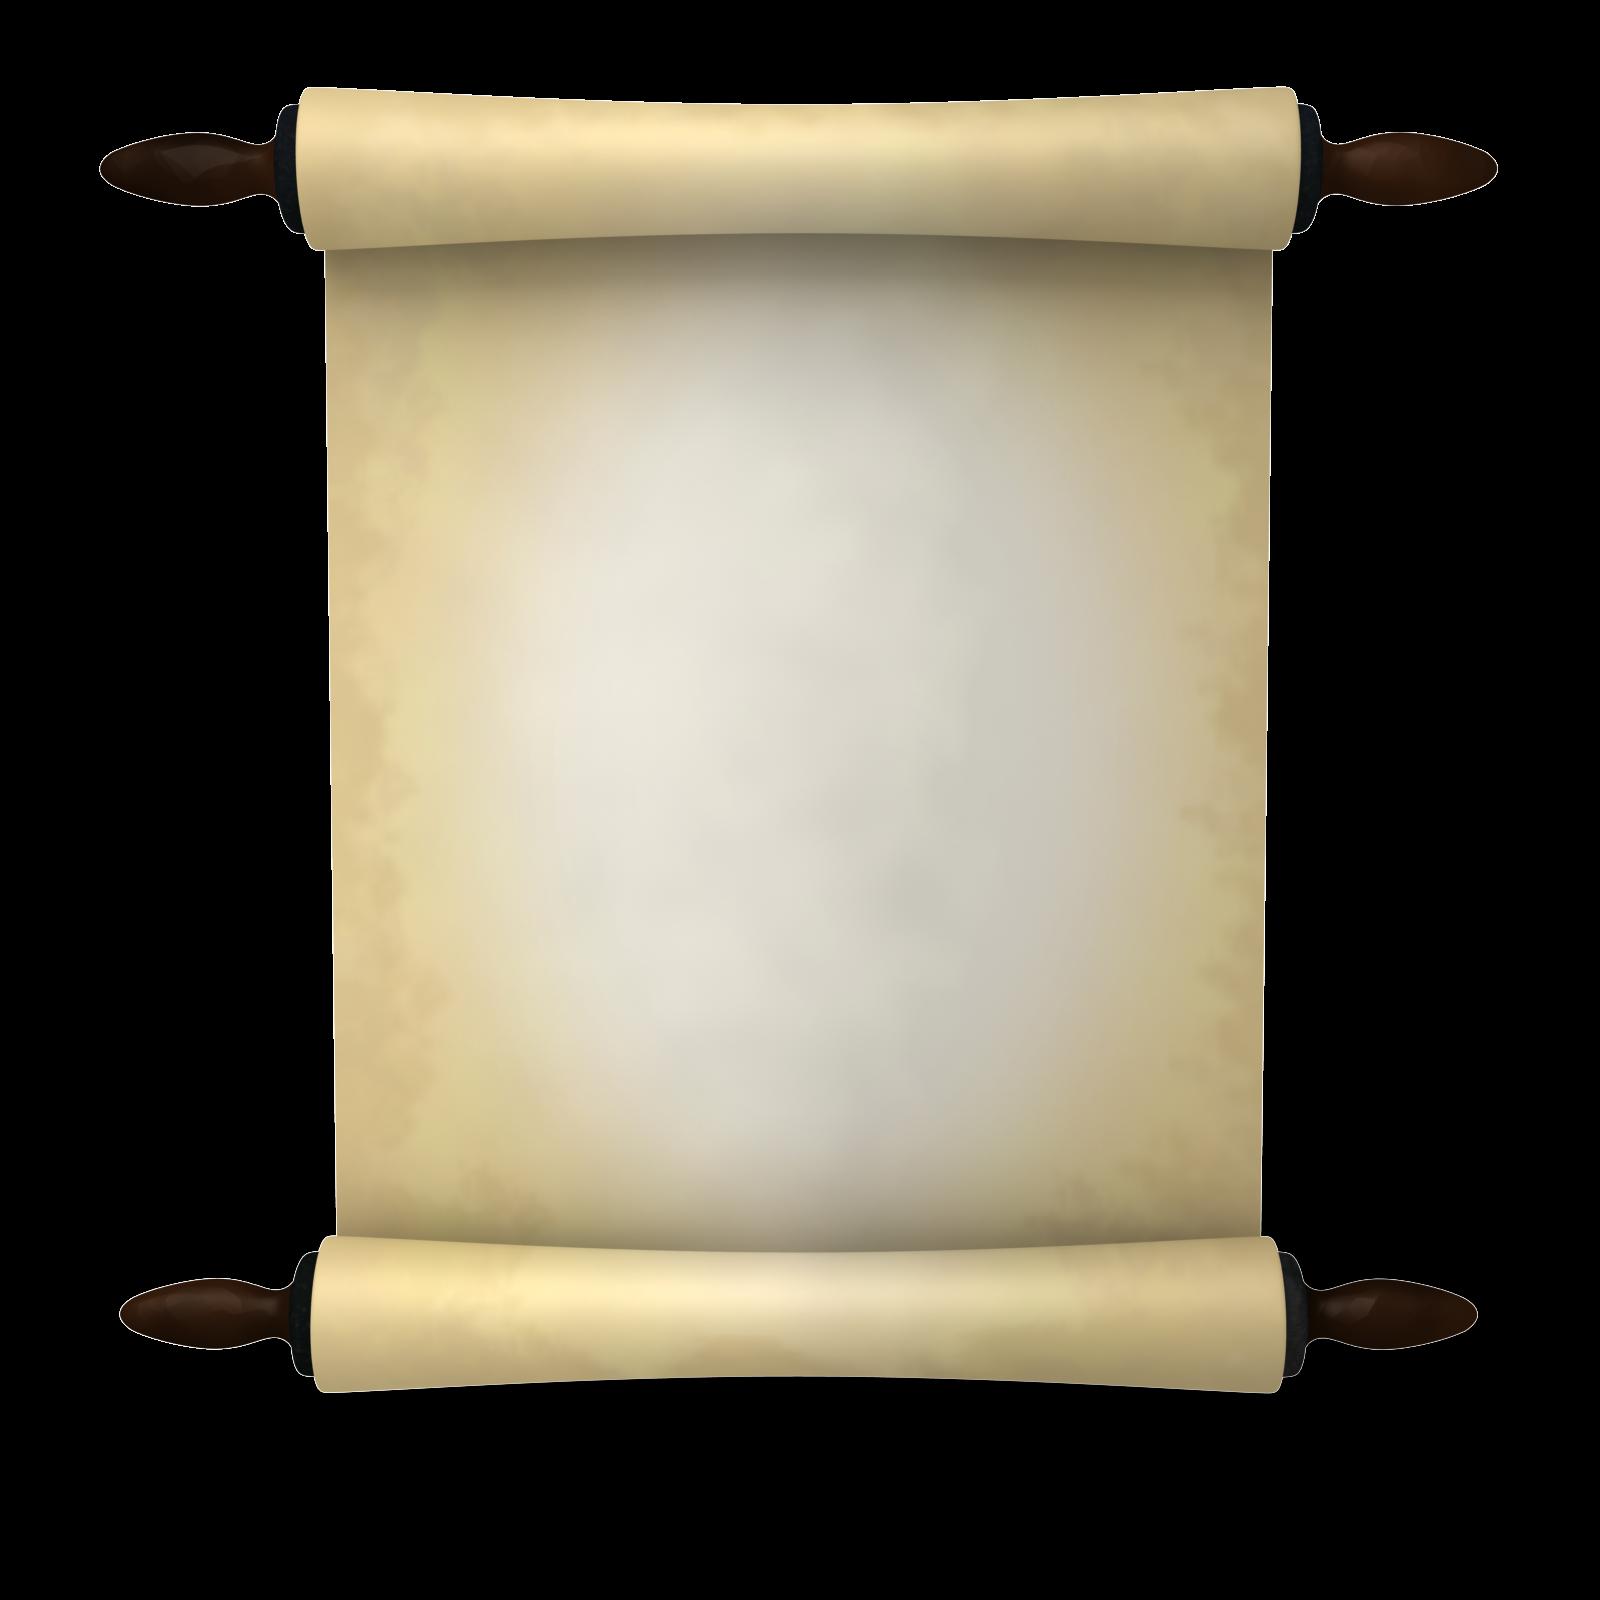 Parchment Scroll Clipart - ClipArt Best